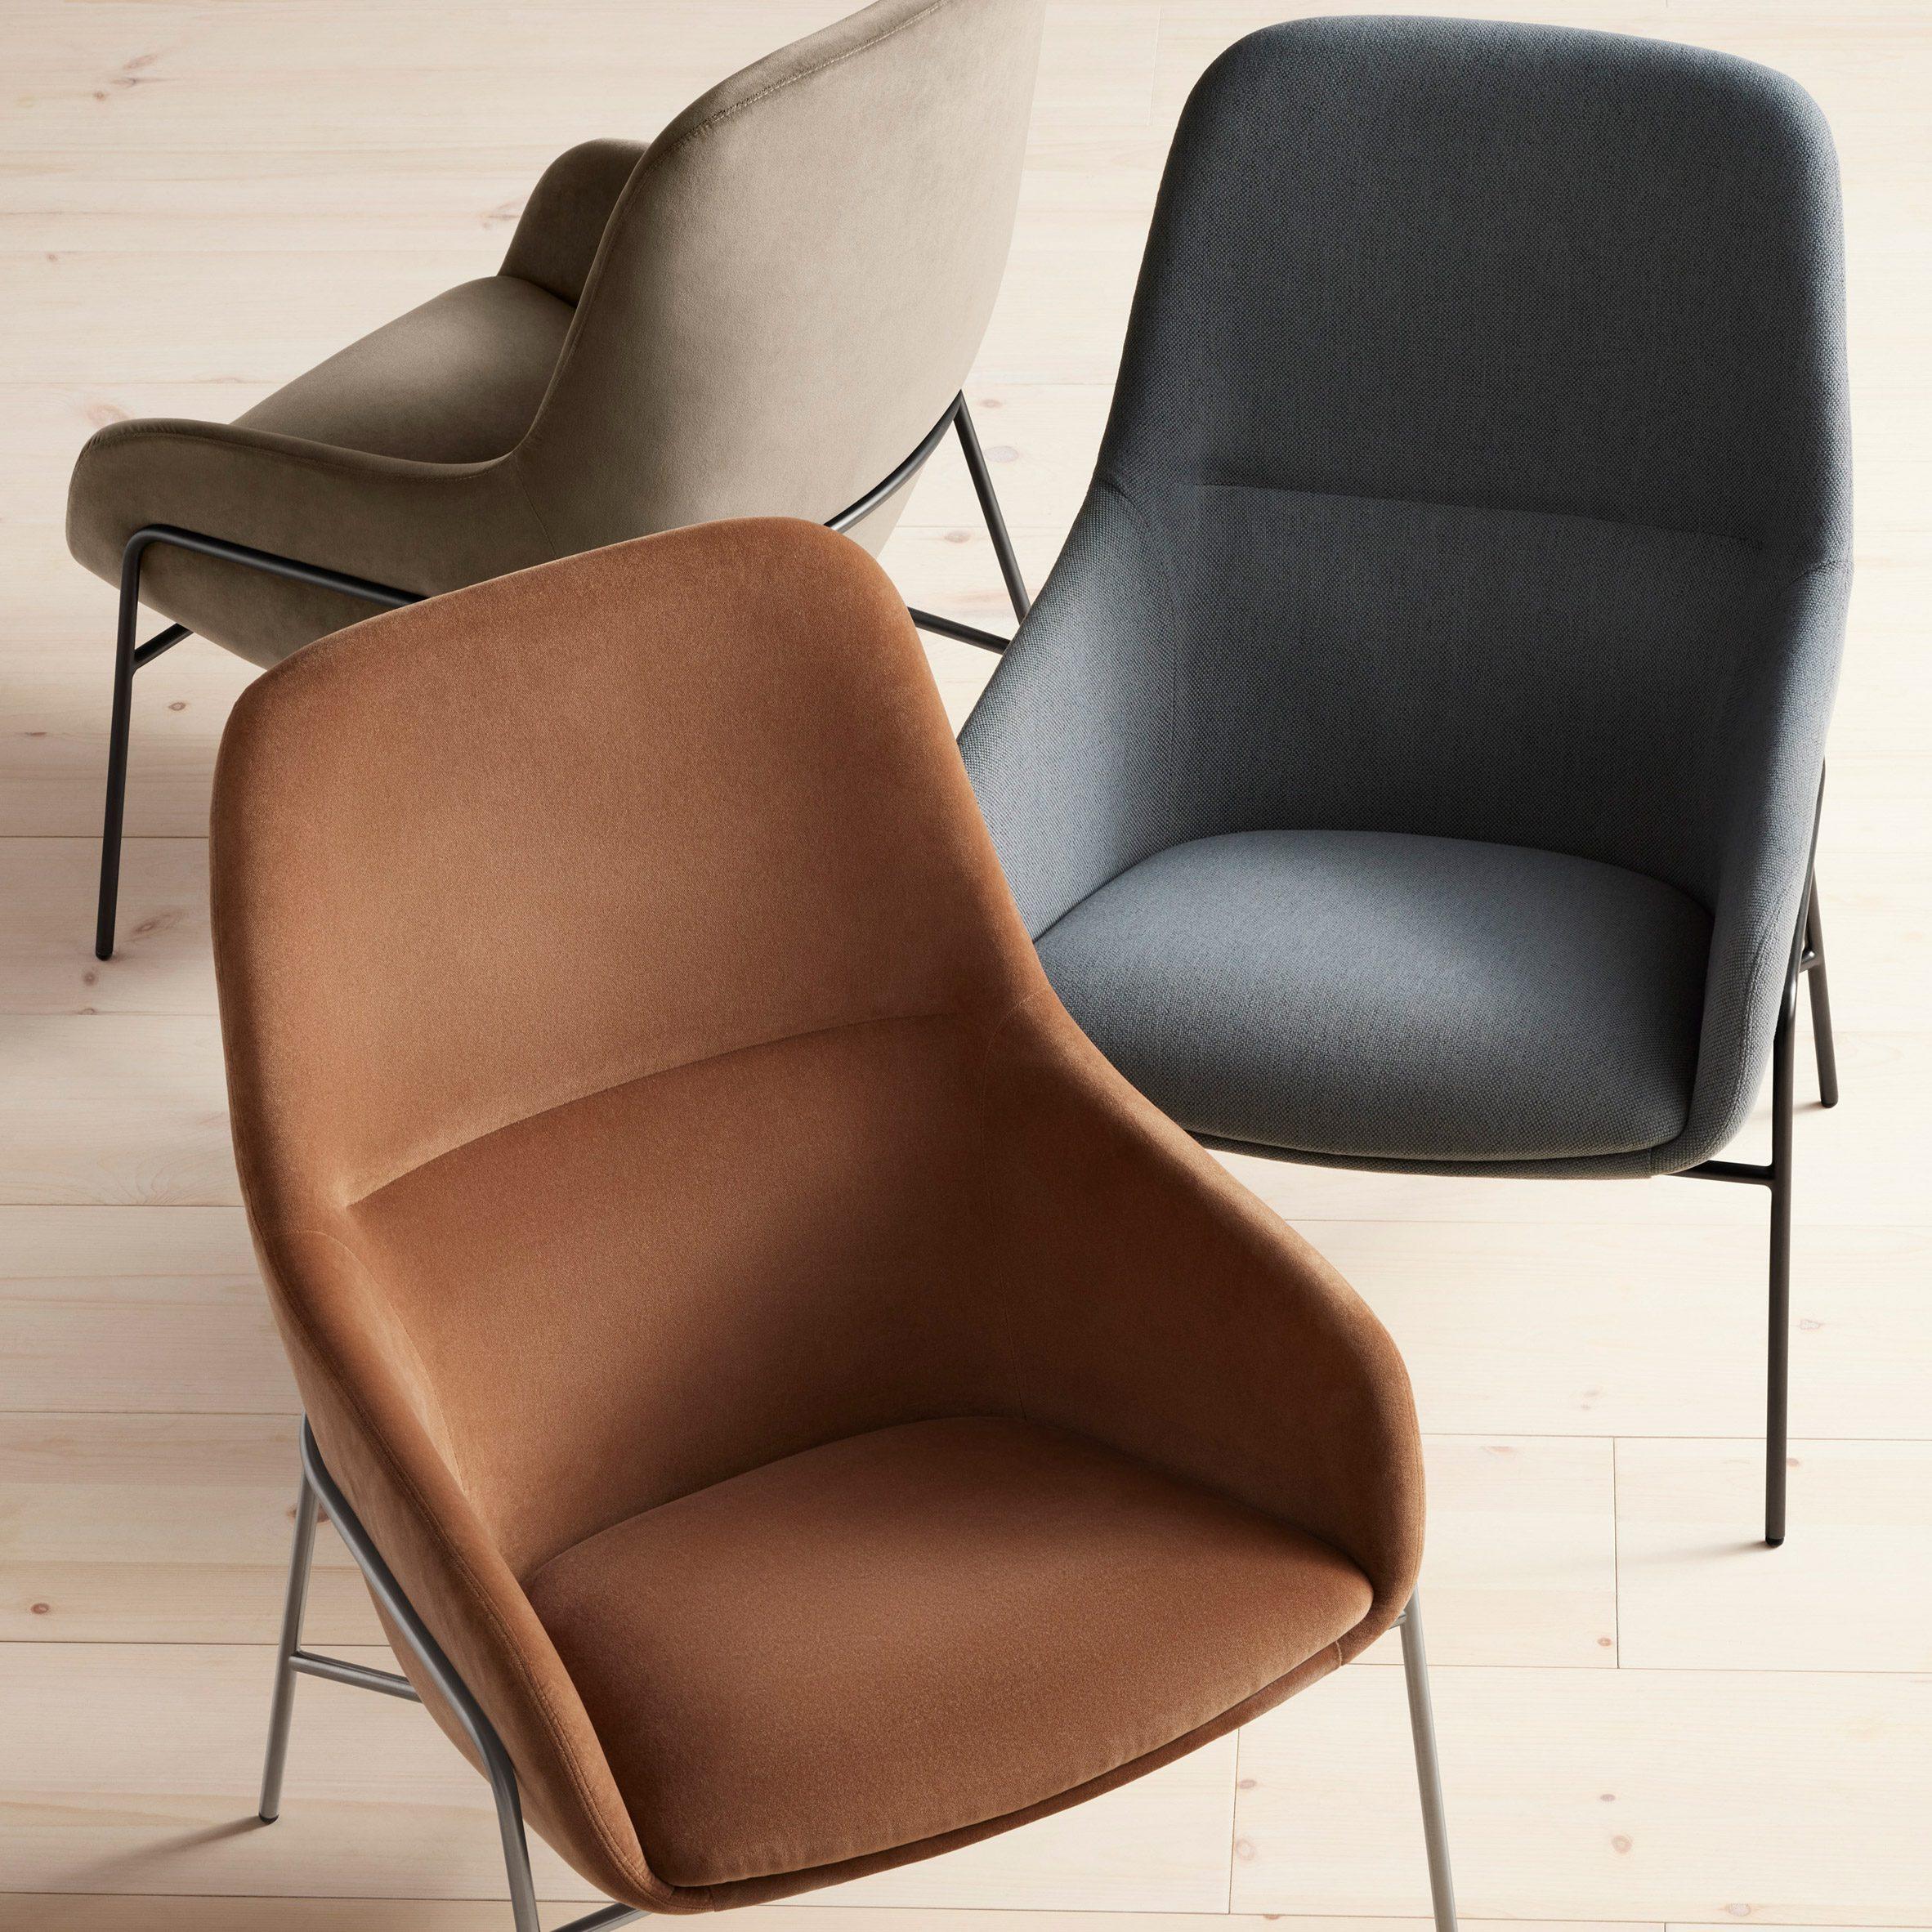 Acre lounge chair by Blu Dot